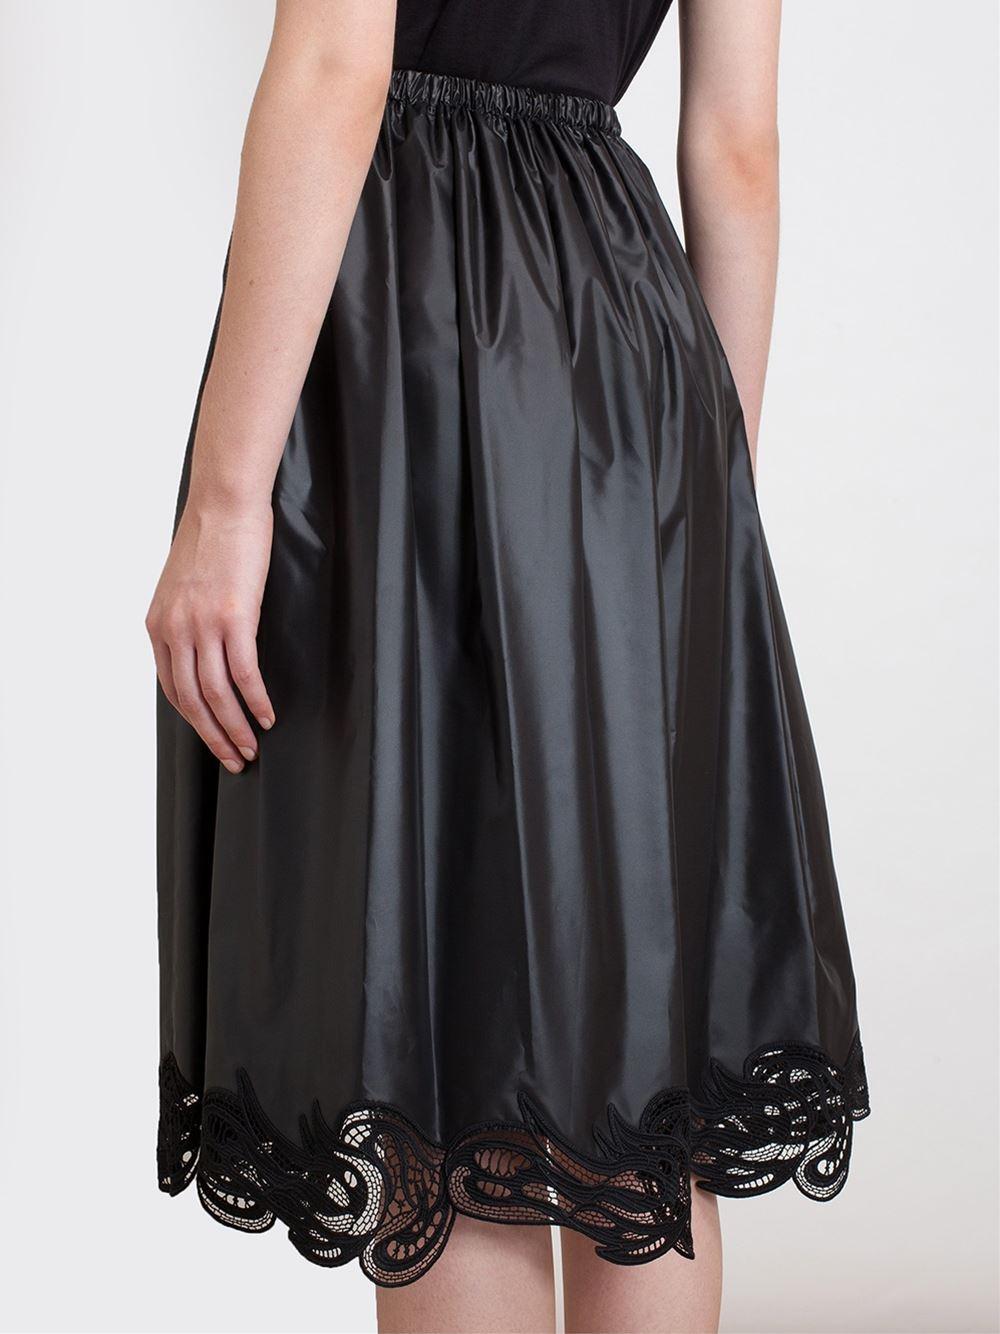 Christopher Kane Lace Hem Midi Skirt - Browns - Farfetch.com